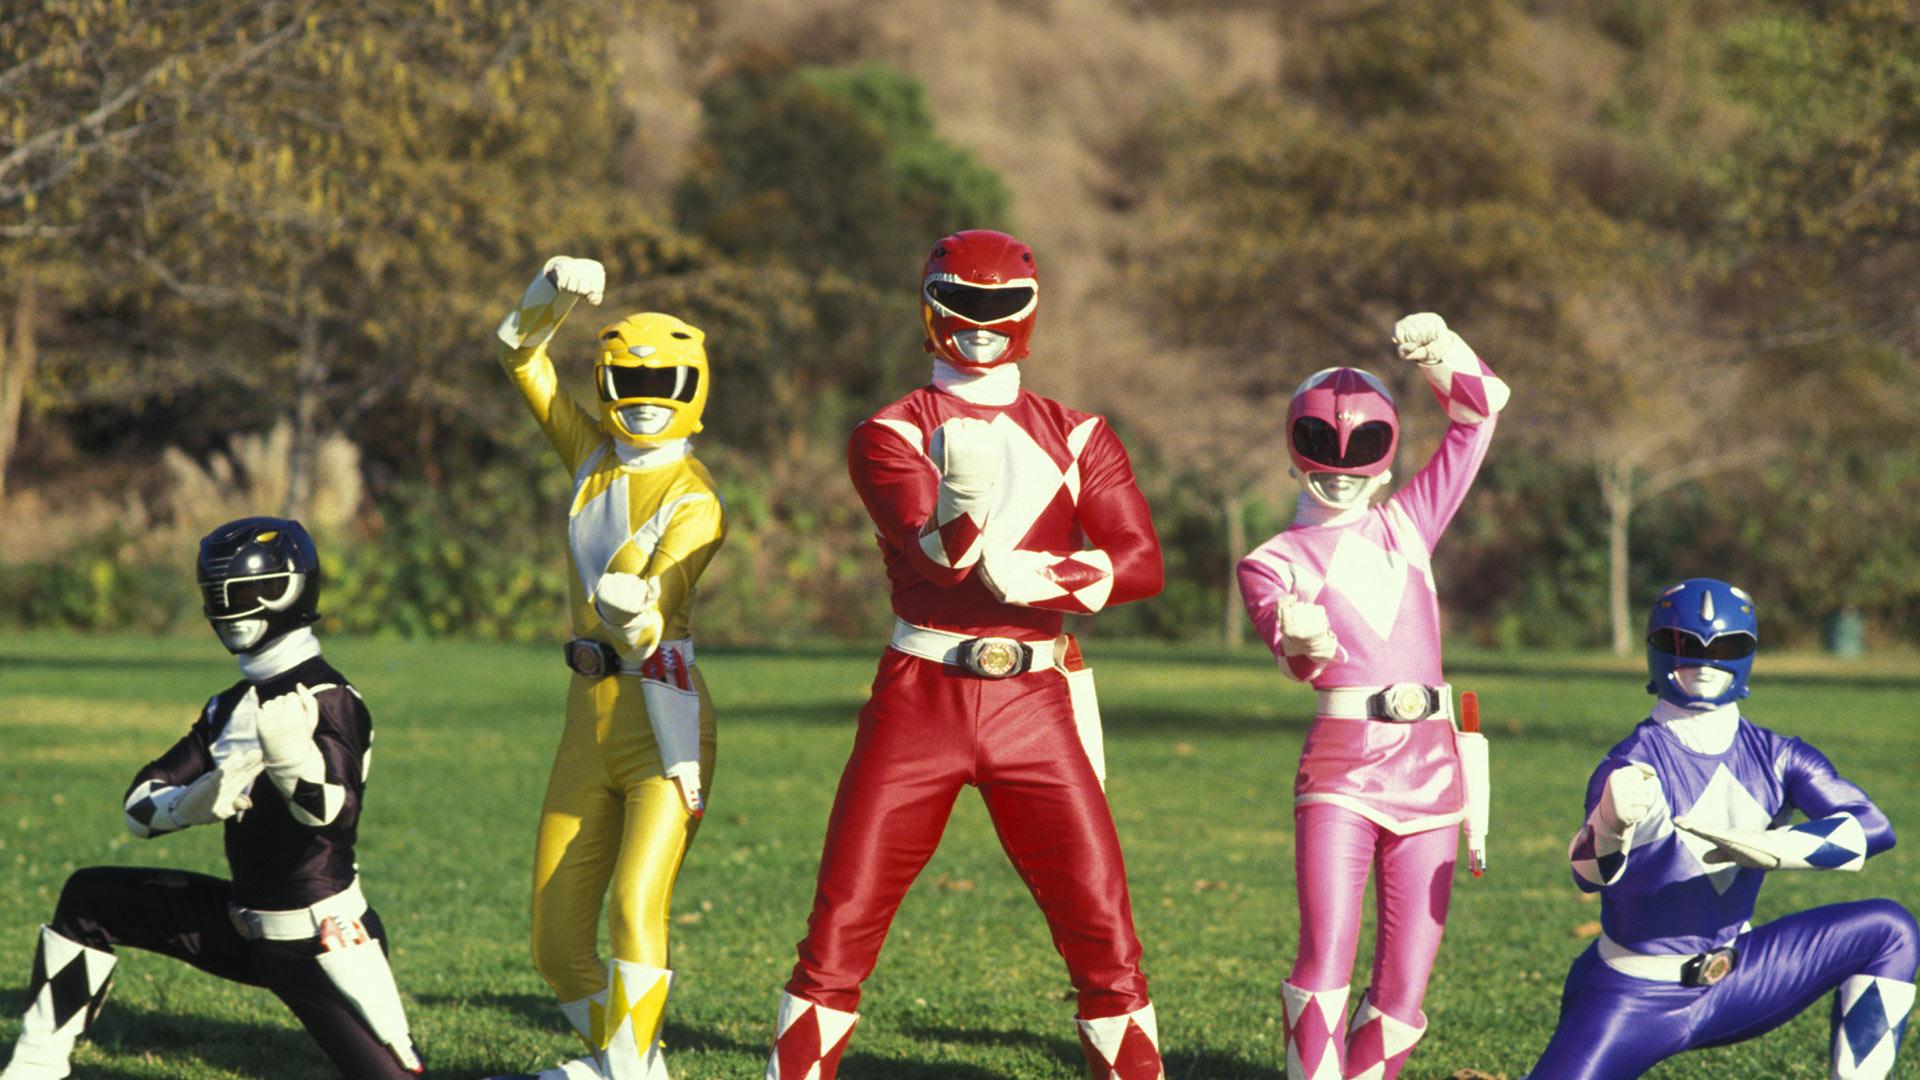 Mighty Morphin Power Rangers Season 1